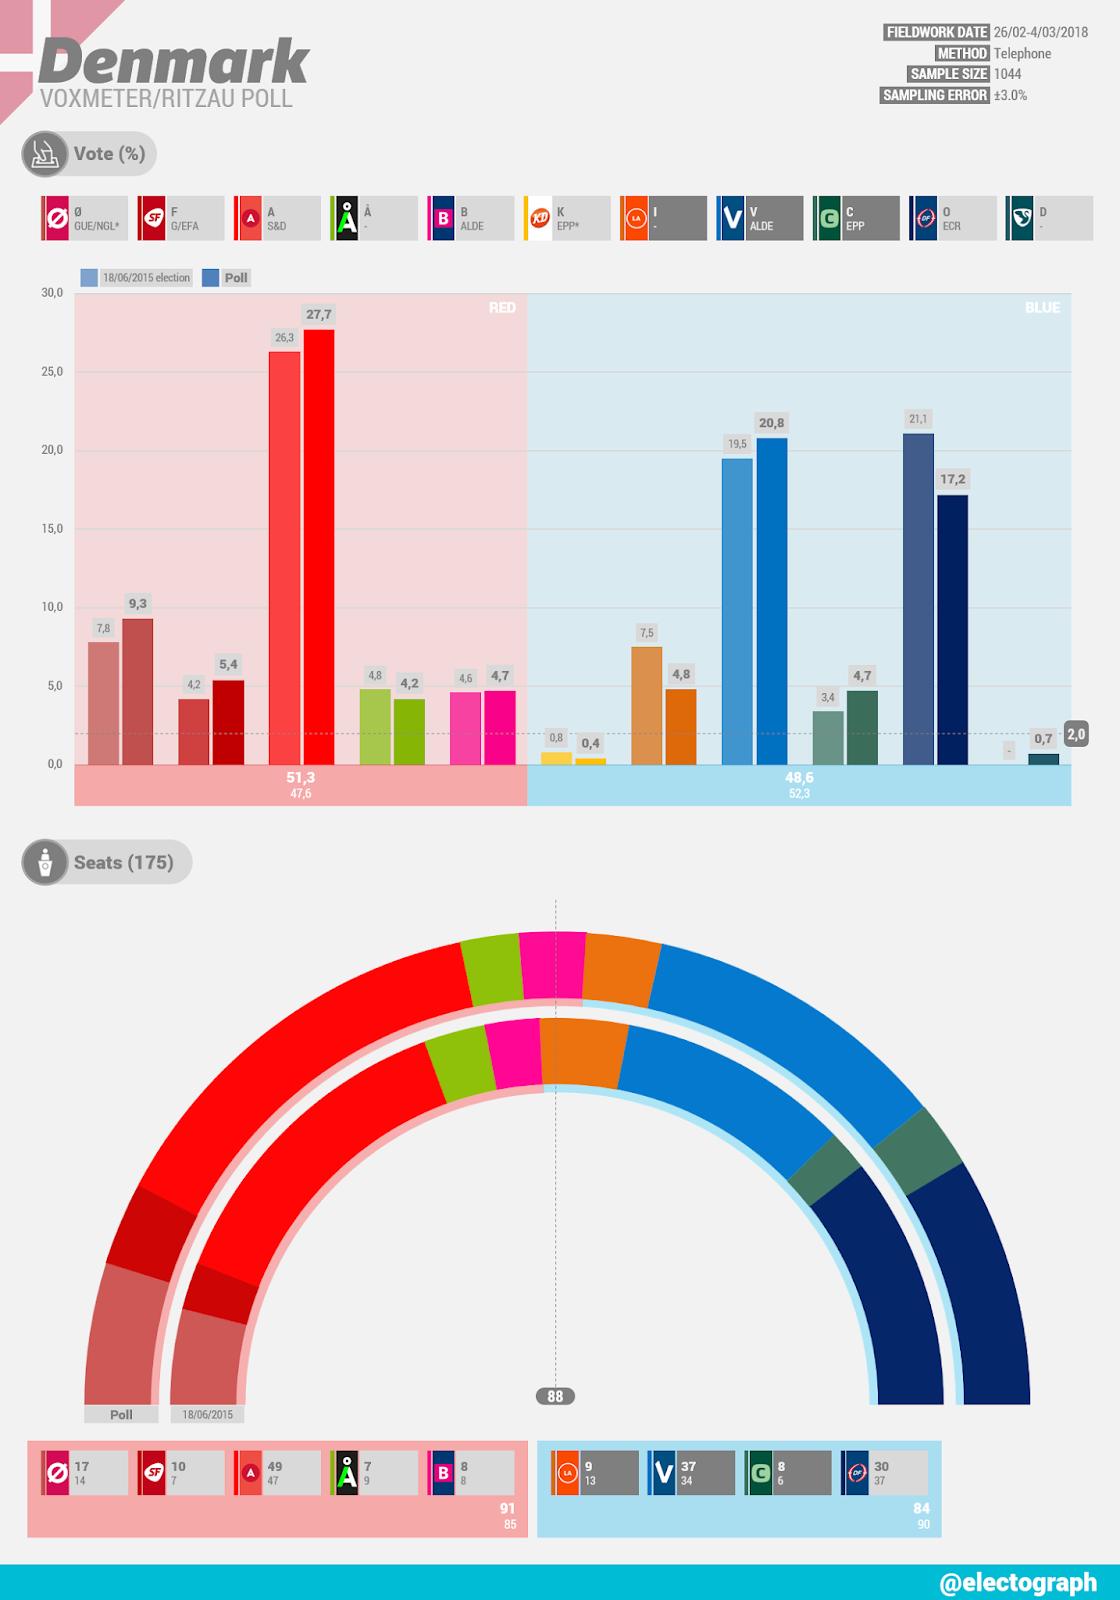 DENMARK Voxmeter poll for Ritzau, March 2018